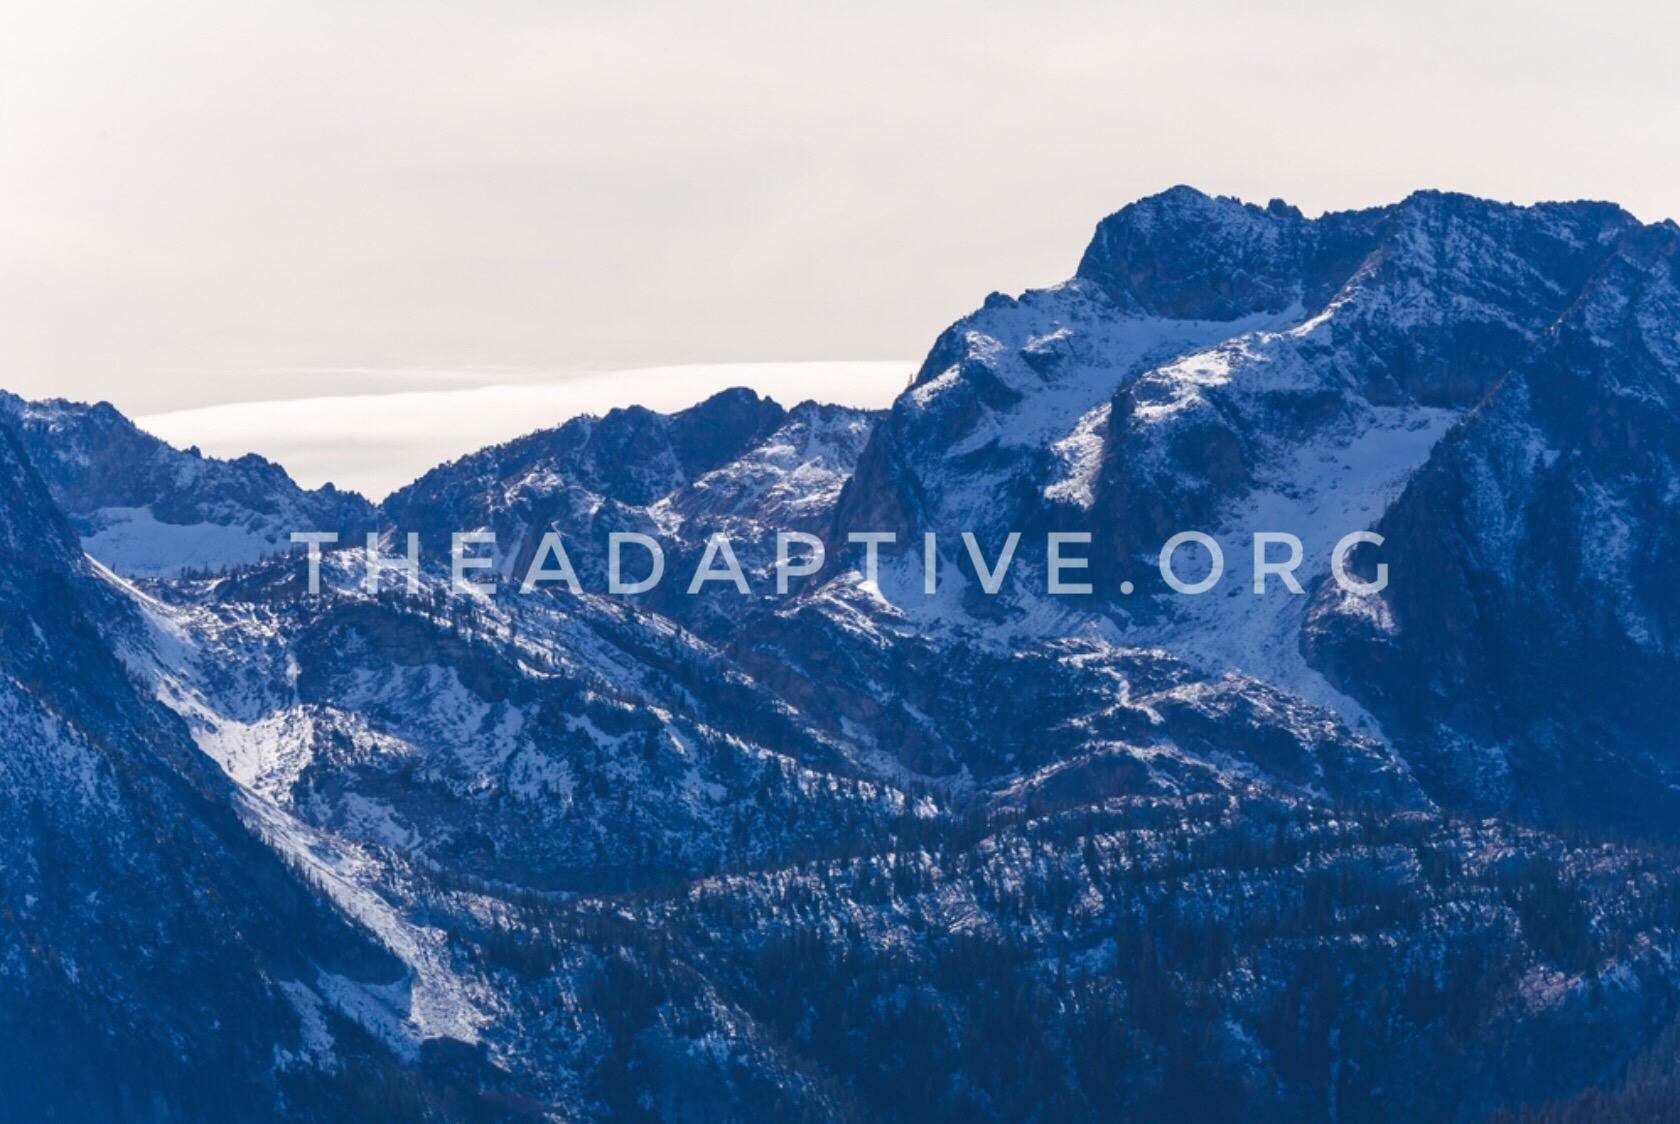 theadaptive.org